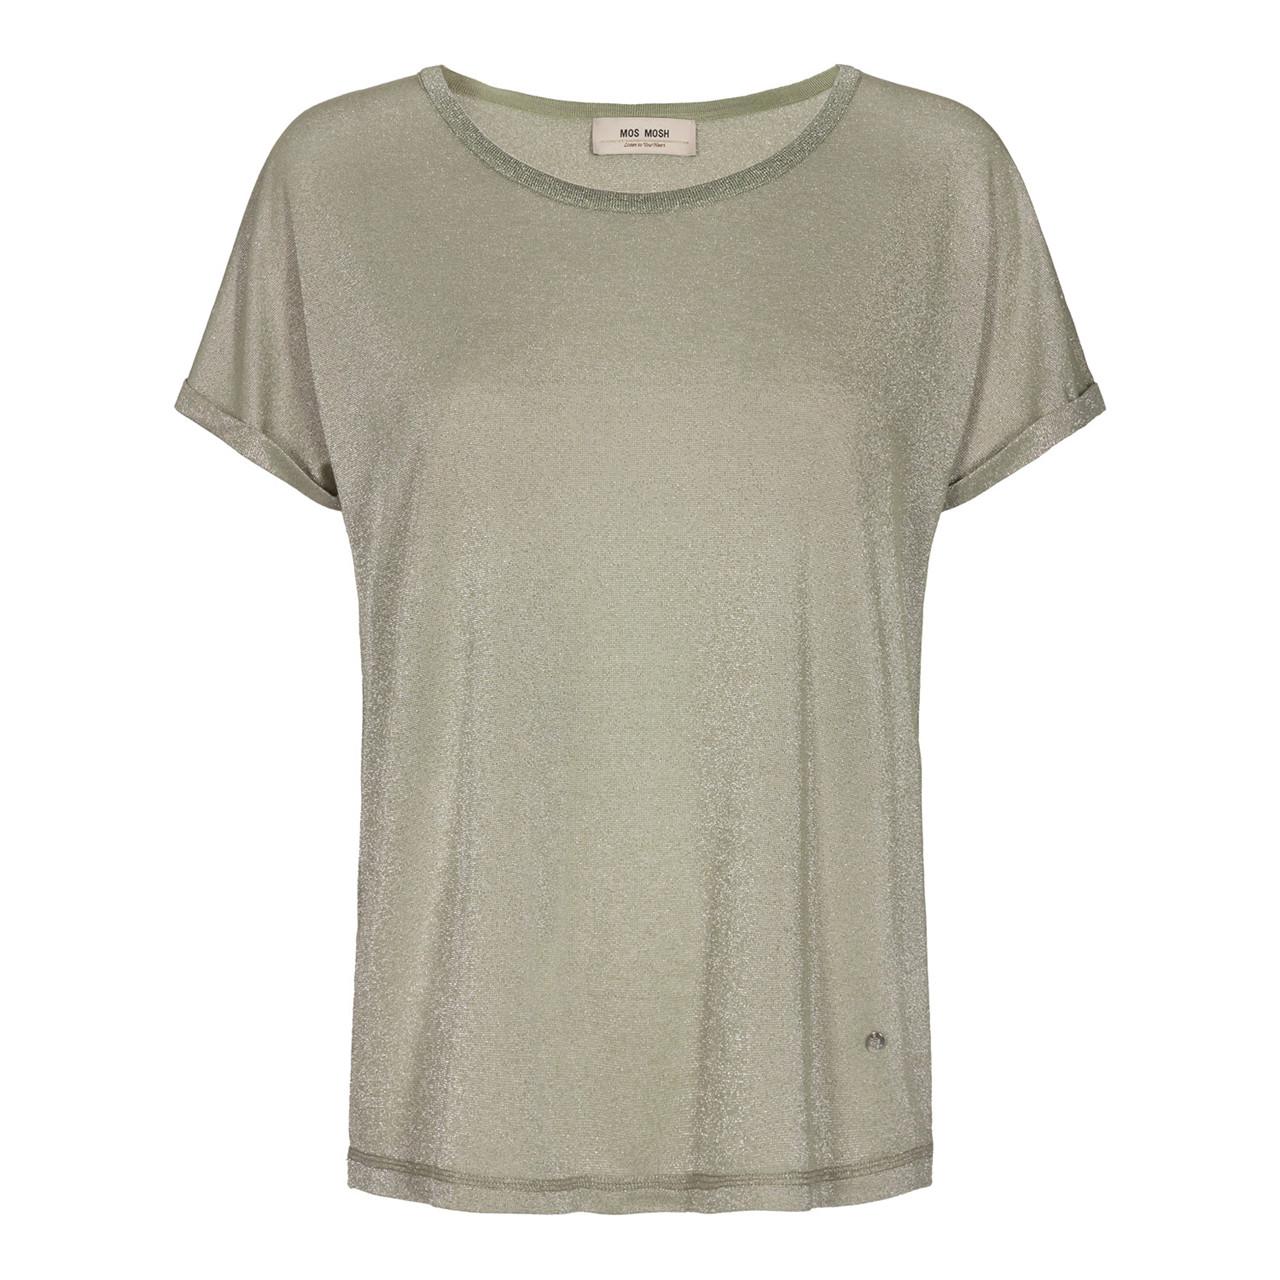 Mos Mosh Kay T Shirt Army | Hurtig levering Shop online